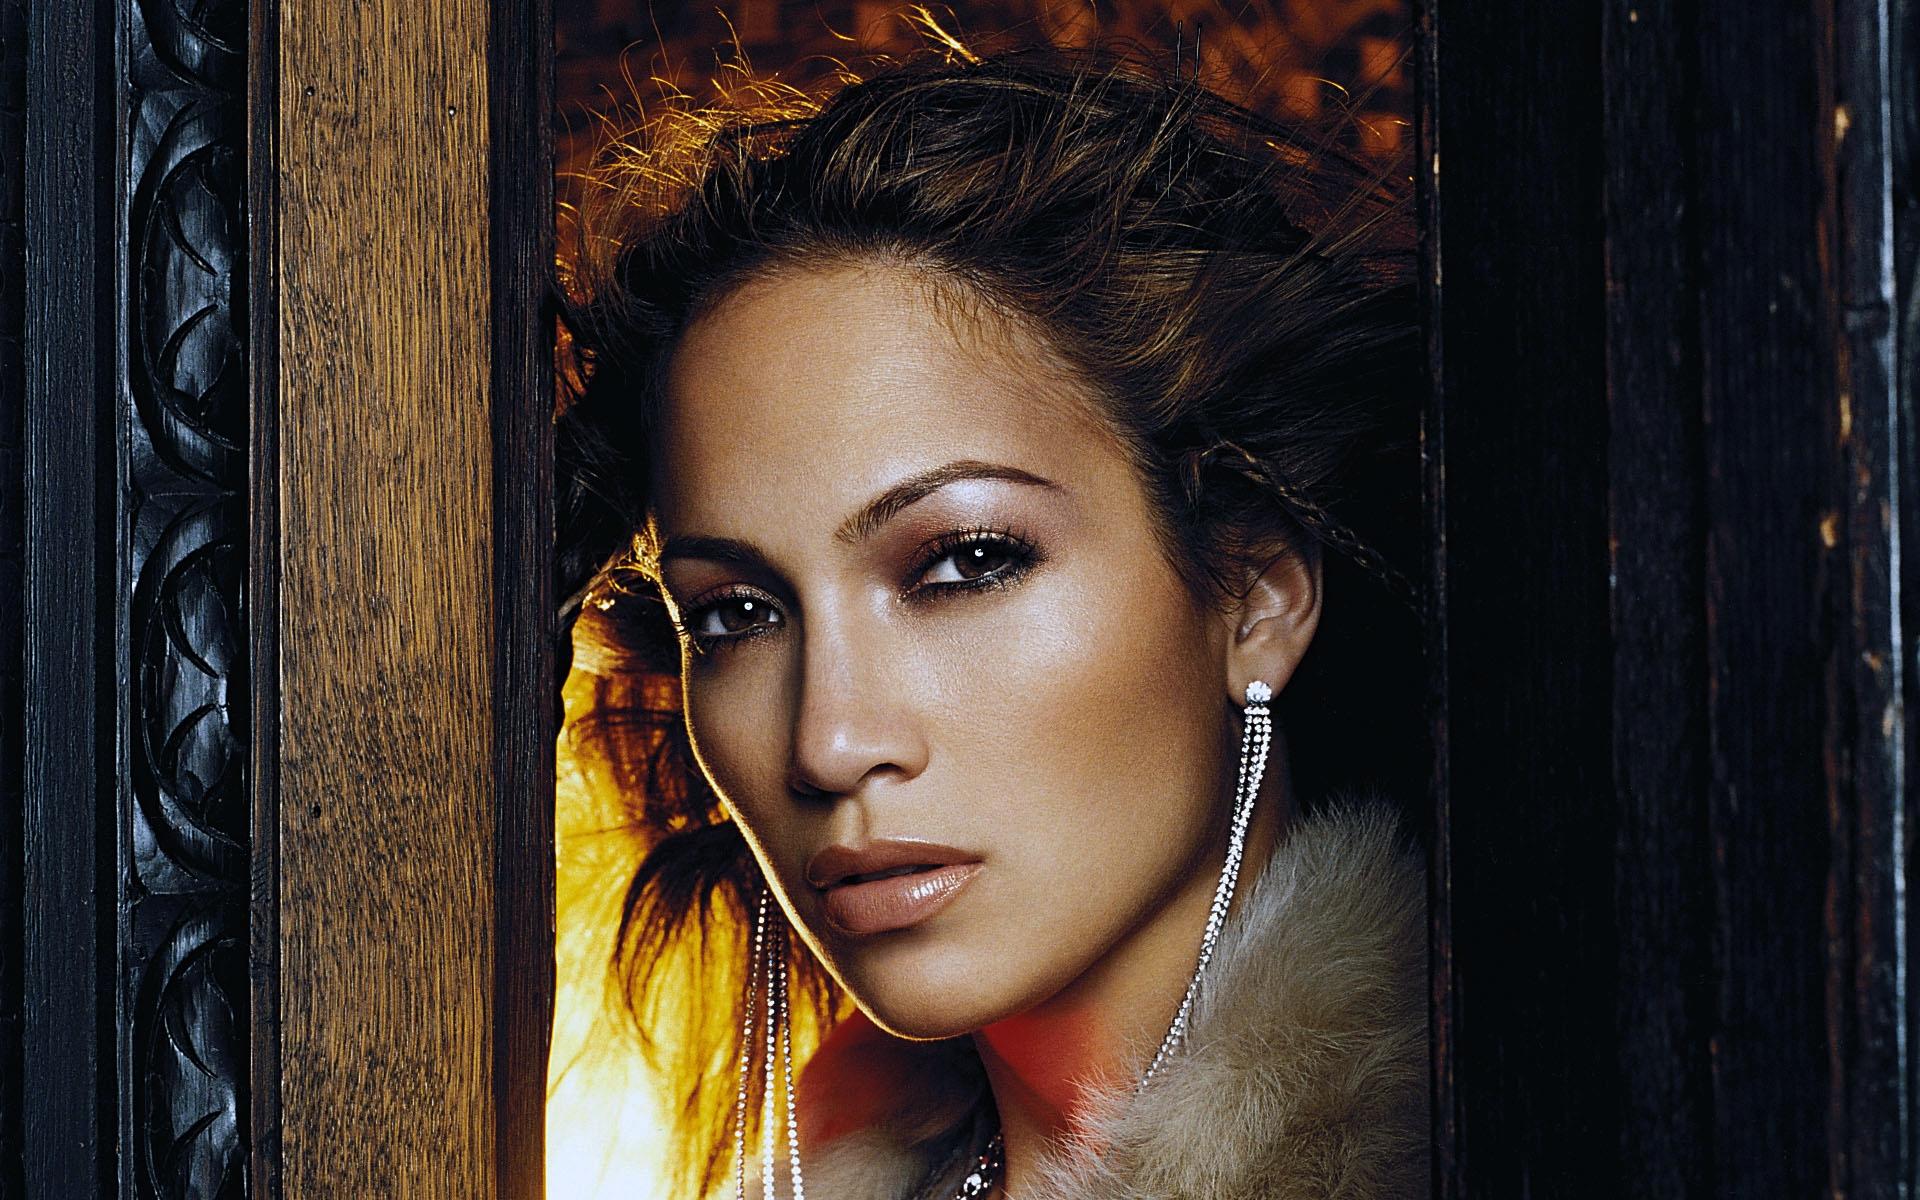 Uma Name Wallpaper 3d Most Attractive Hd Hollywood Actress Wallpapers Dzinepress